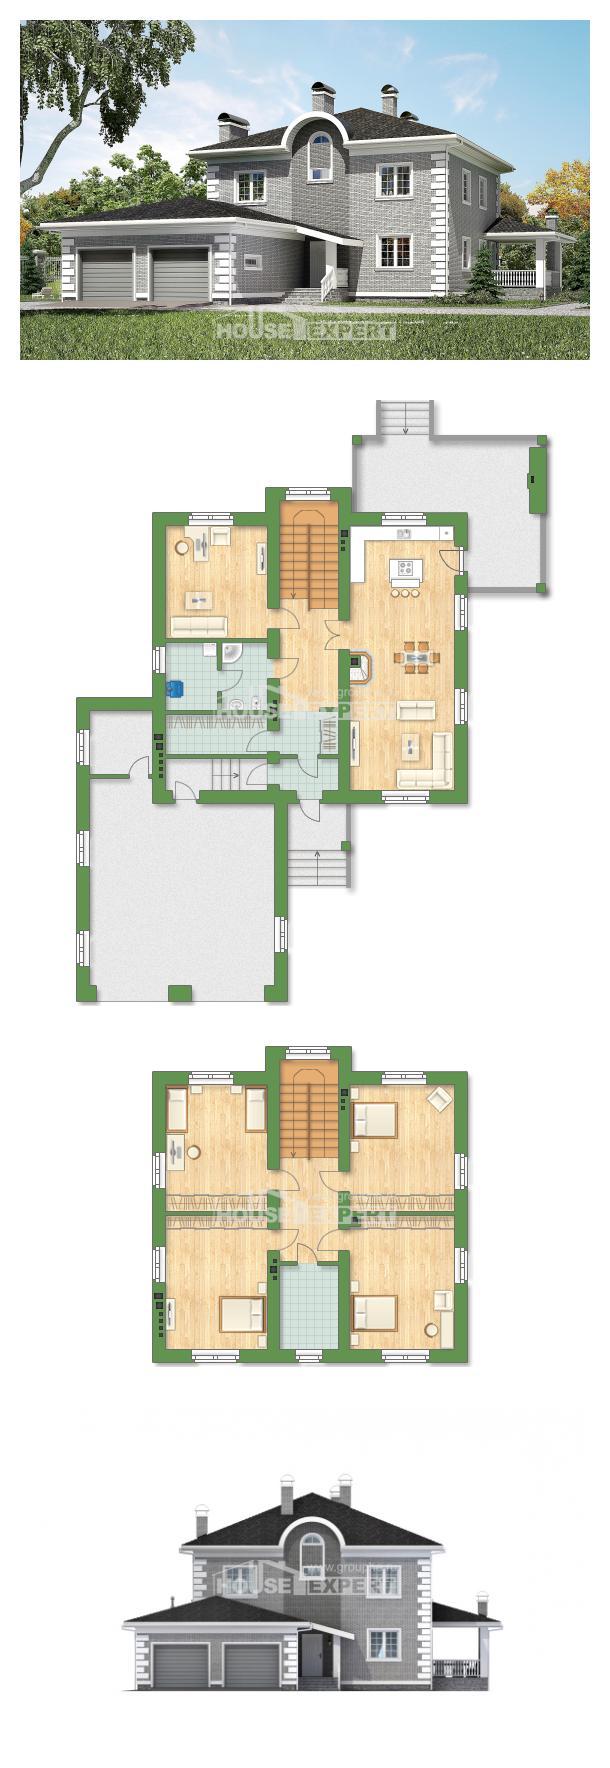 Проект дома 245-004-Л | House Expert